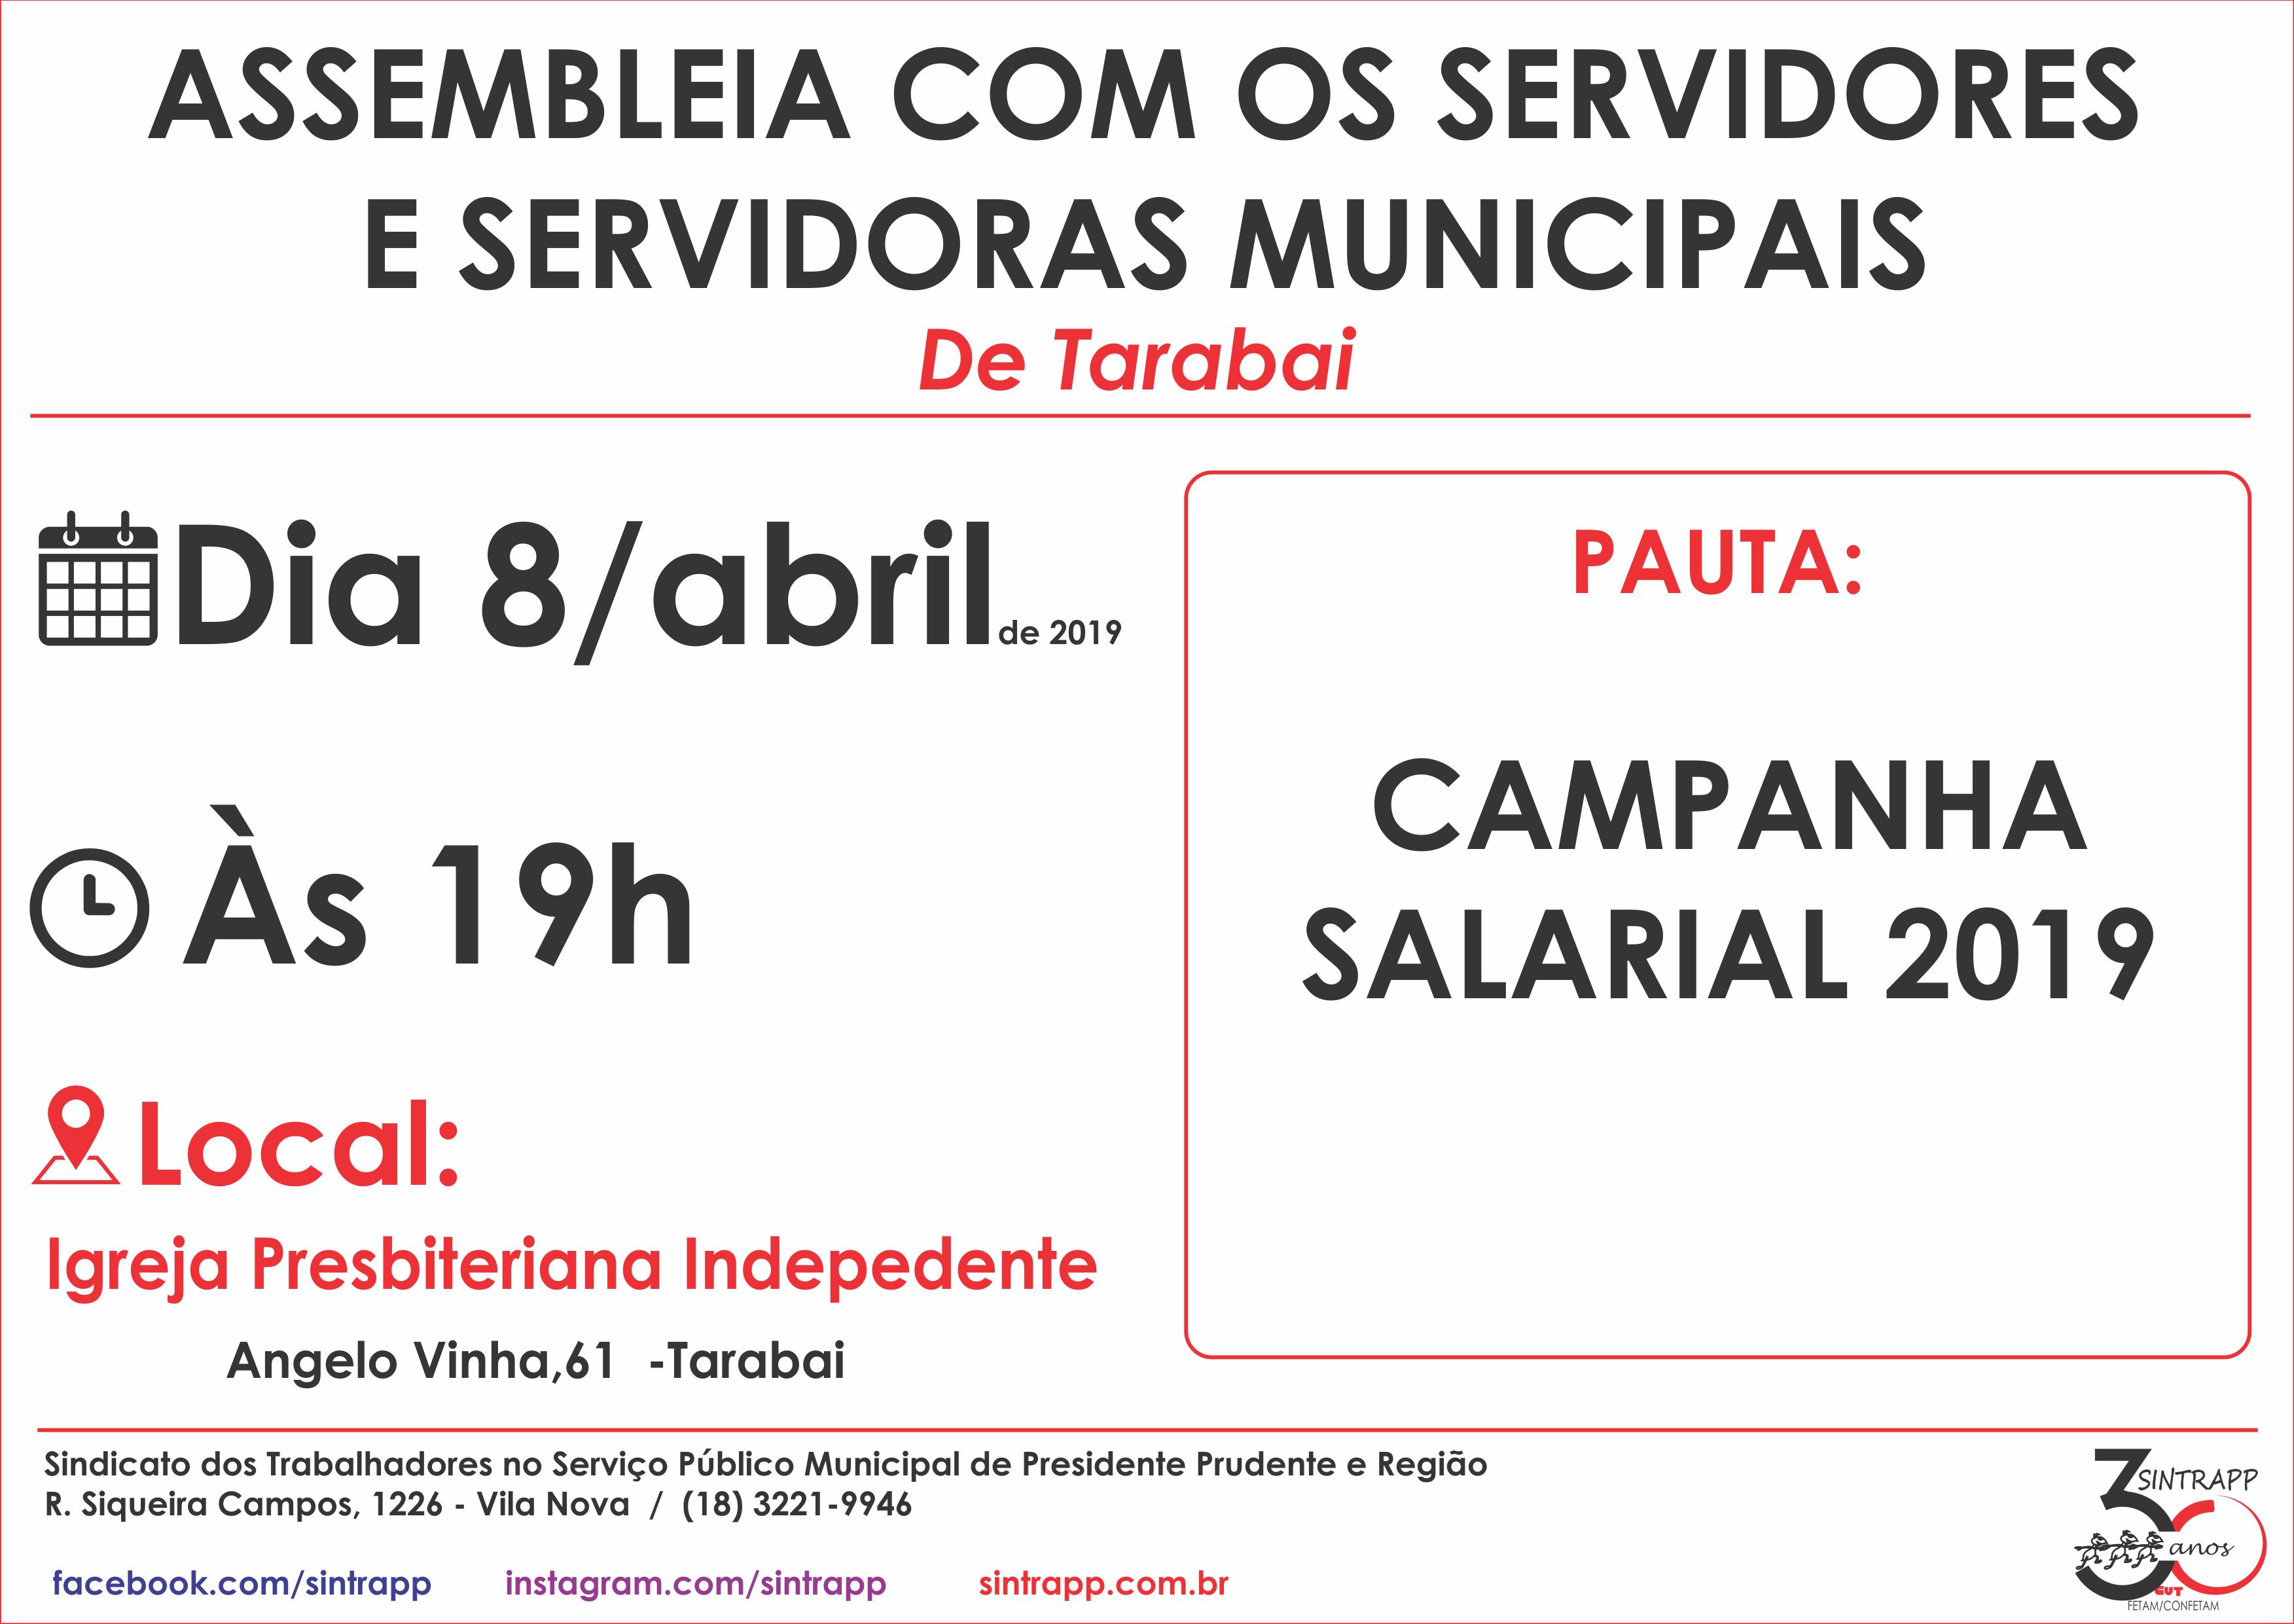 Sindicato convoca servidores e servidoras de Tarabai para assembleia